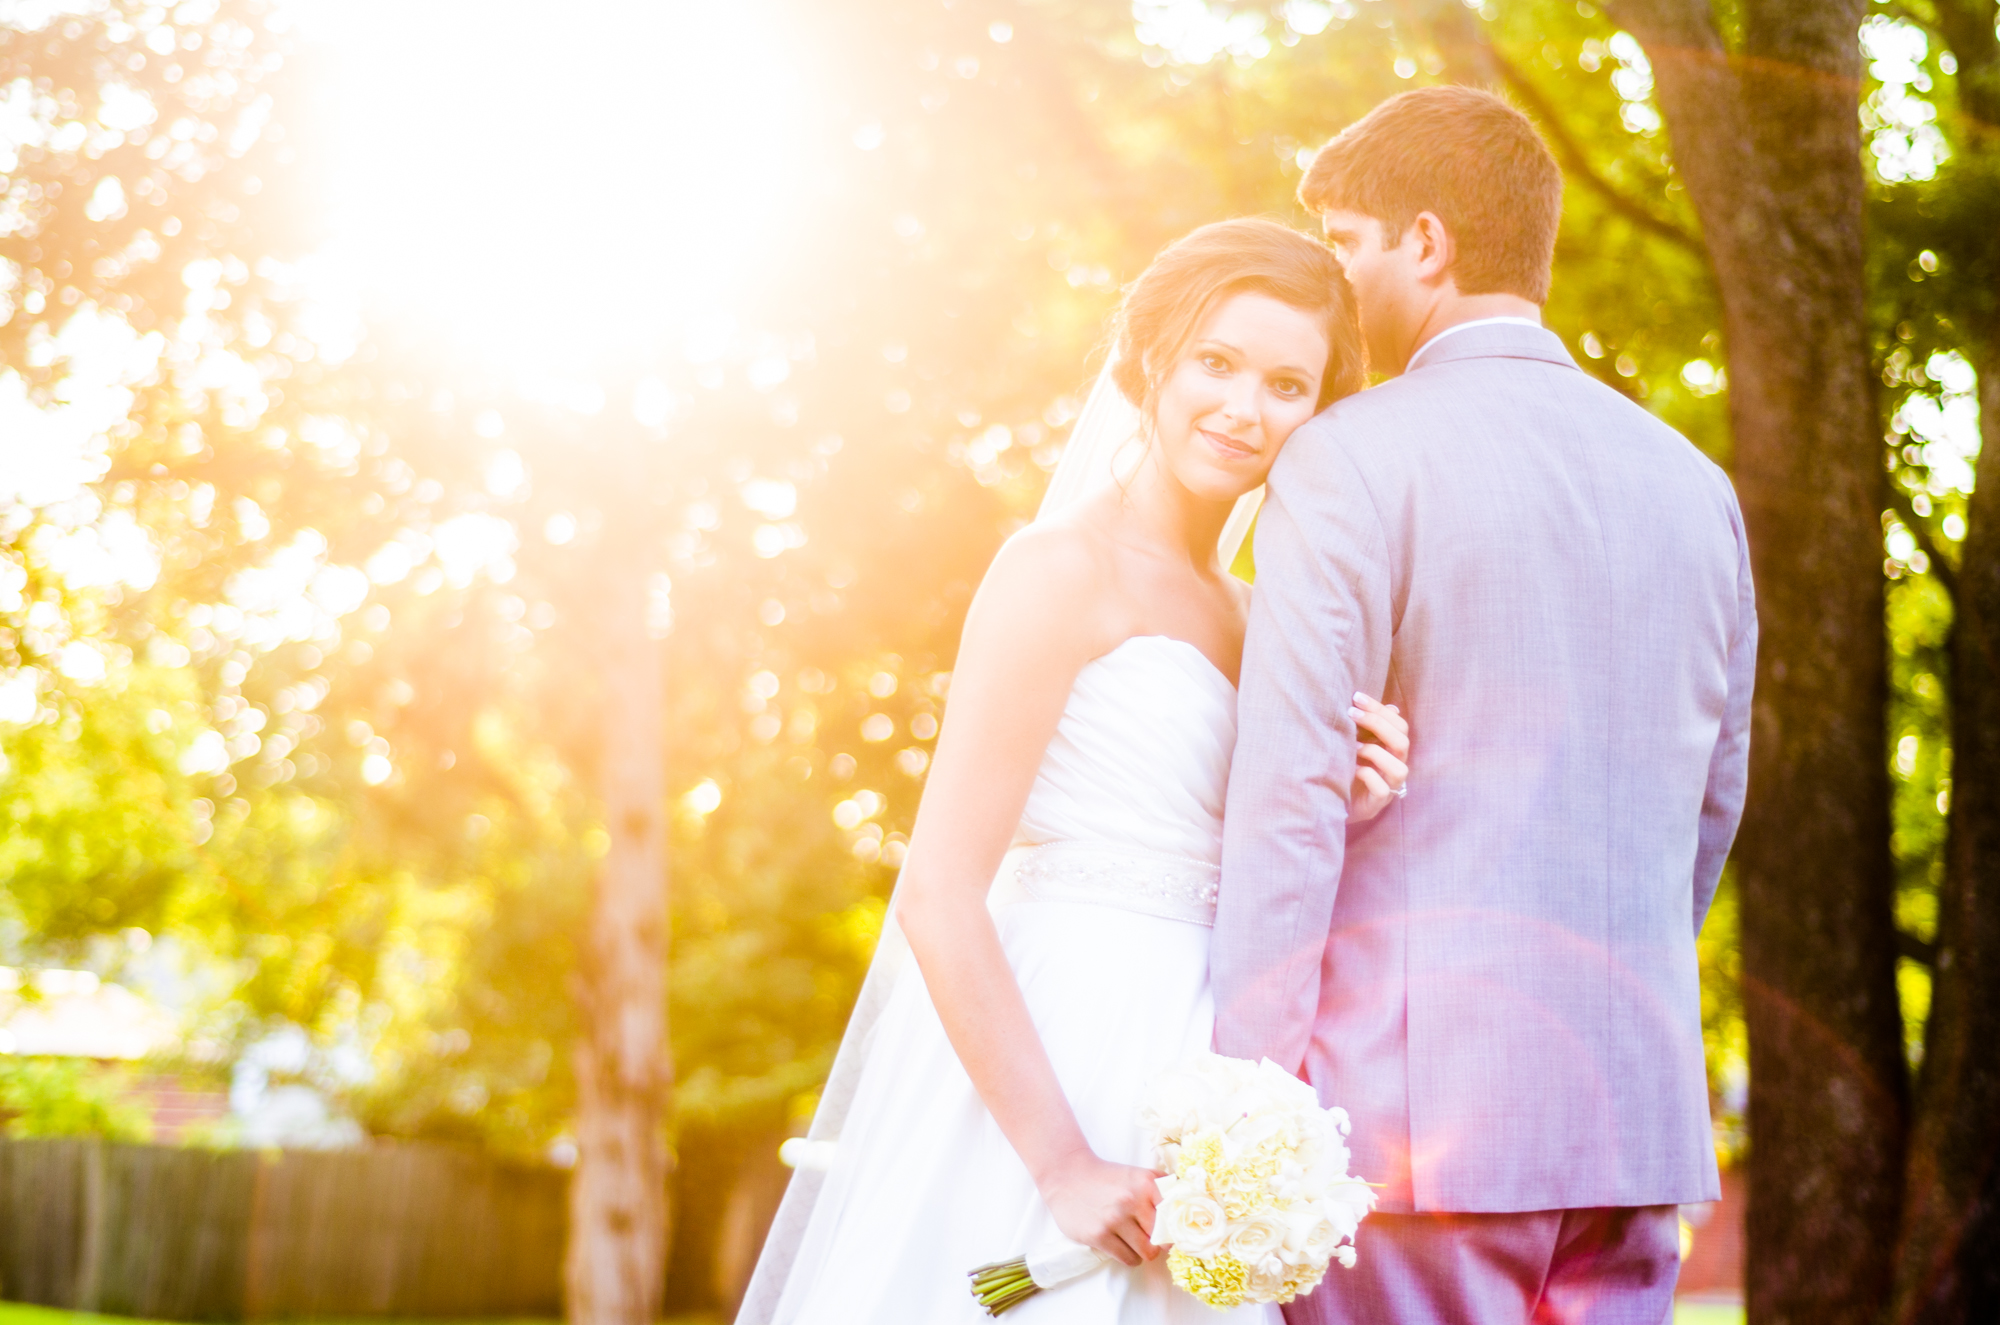 emily_brennan_bowling_green_ky_wedding-7052.jpg